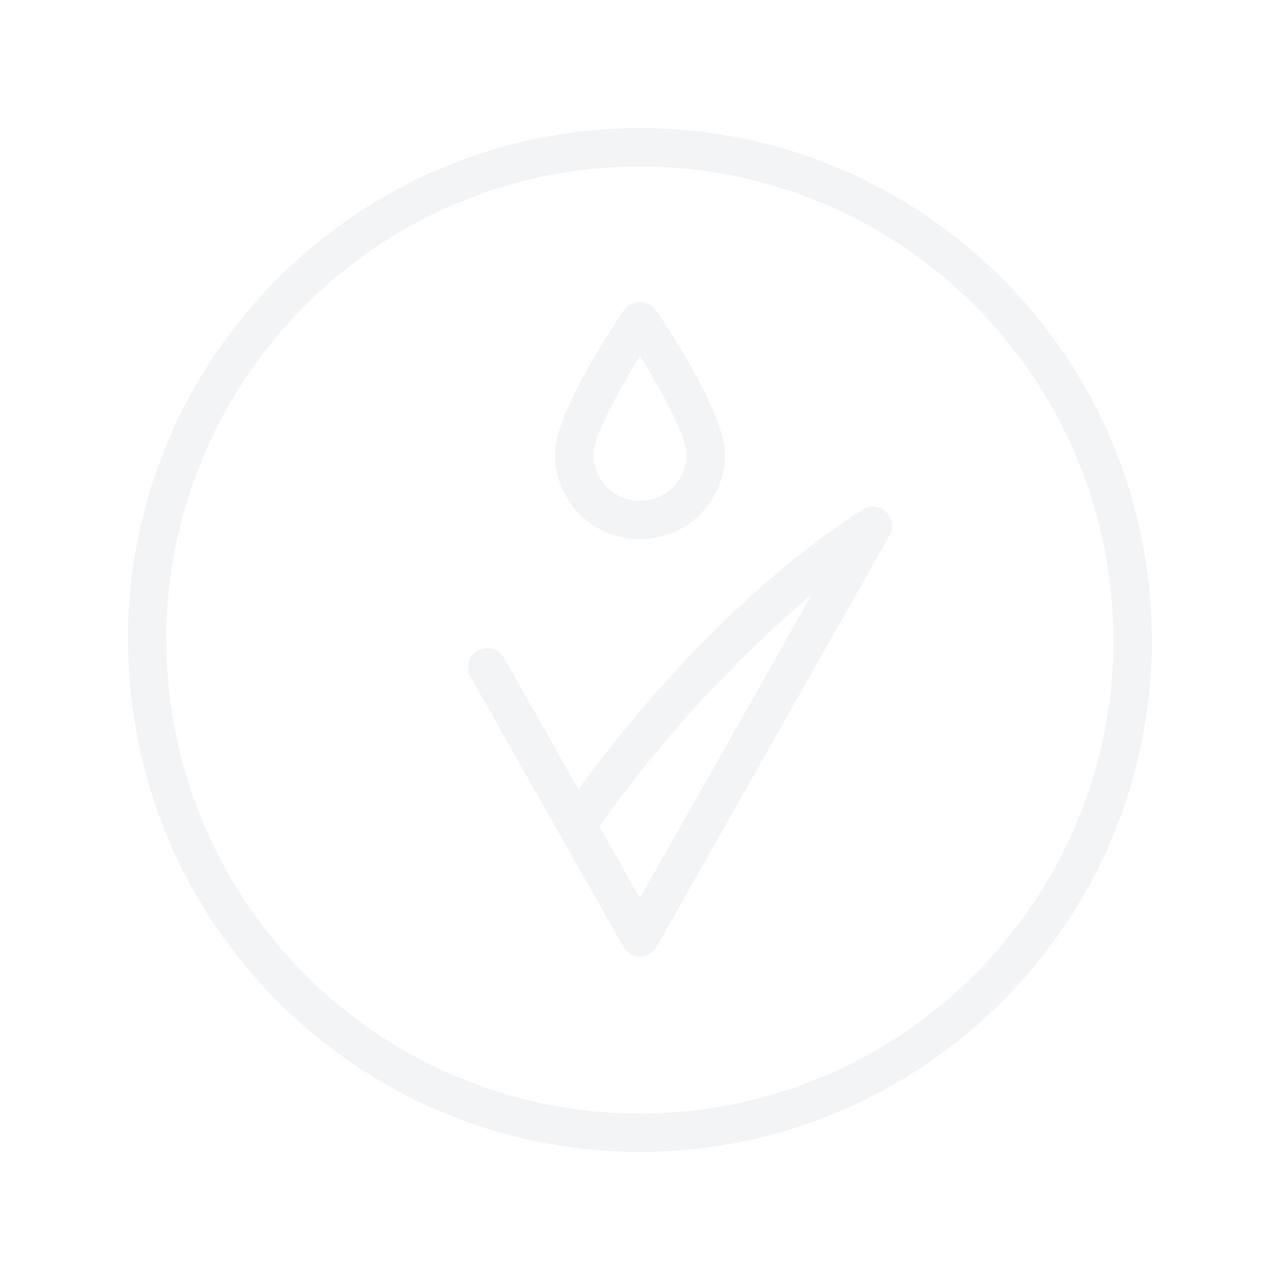 LA ROCHE-POSAY Anthelios XL Dry Touch Gel-Cream SPF50 50ml